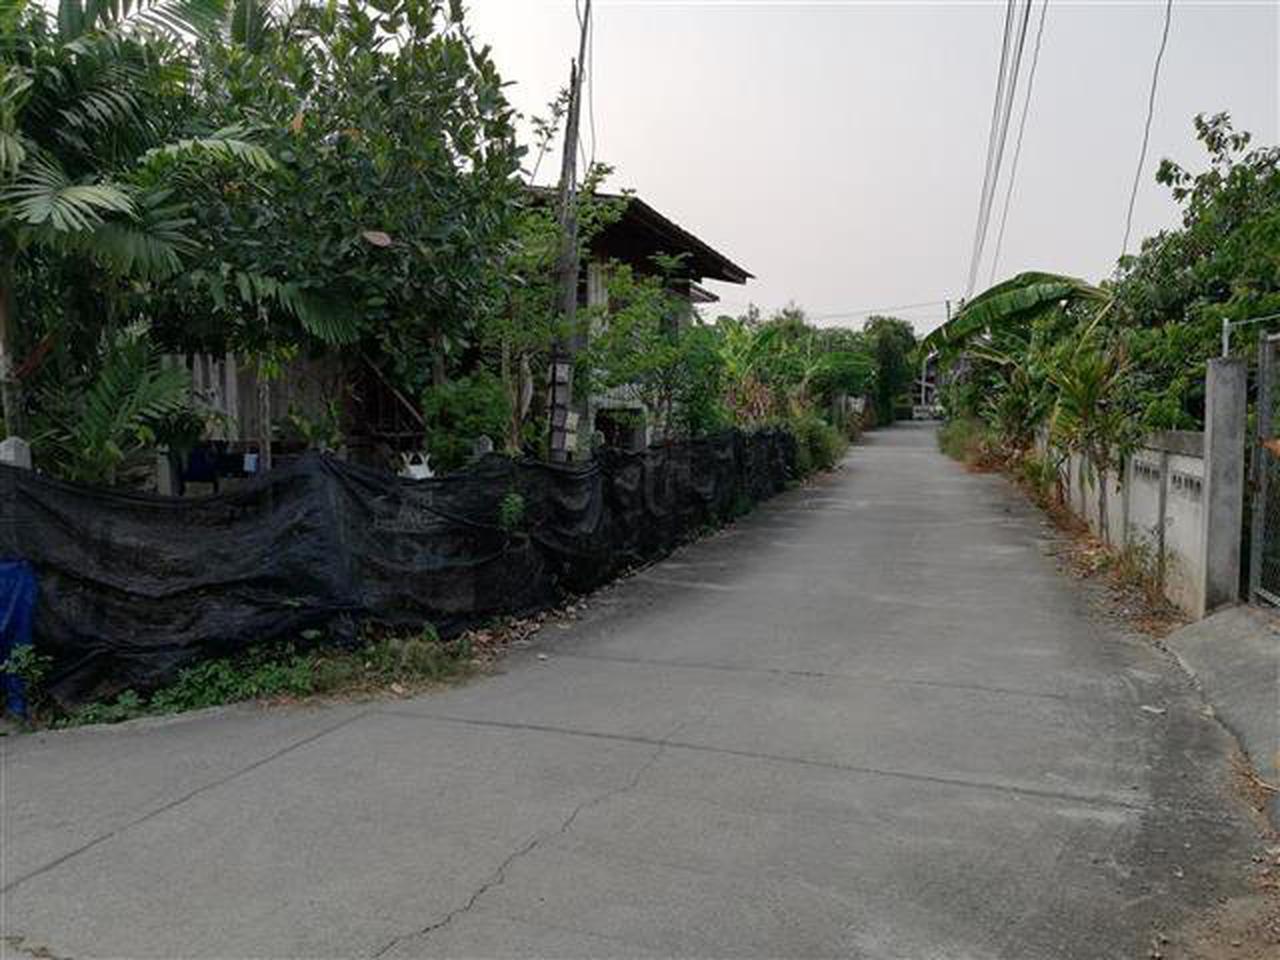 SS163ขายบ้านเก่าในที่ดิน63ตรว.ติดทางสาธารณประโยชน์ถึงสองด้าน รูปที่ 1